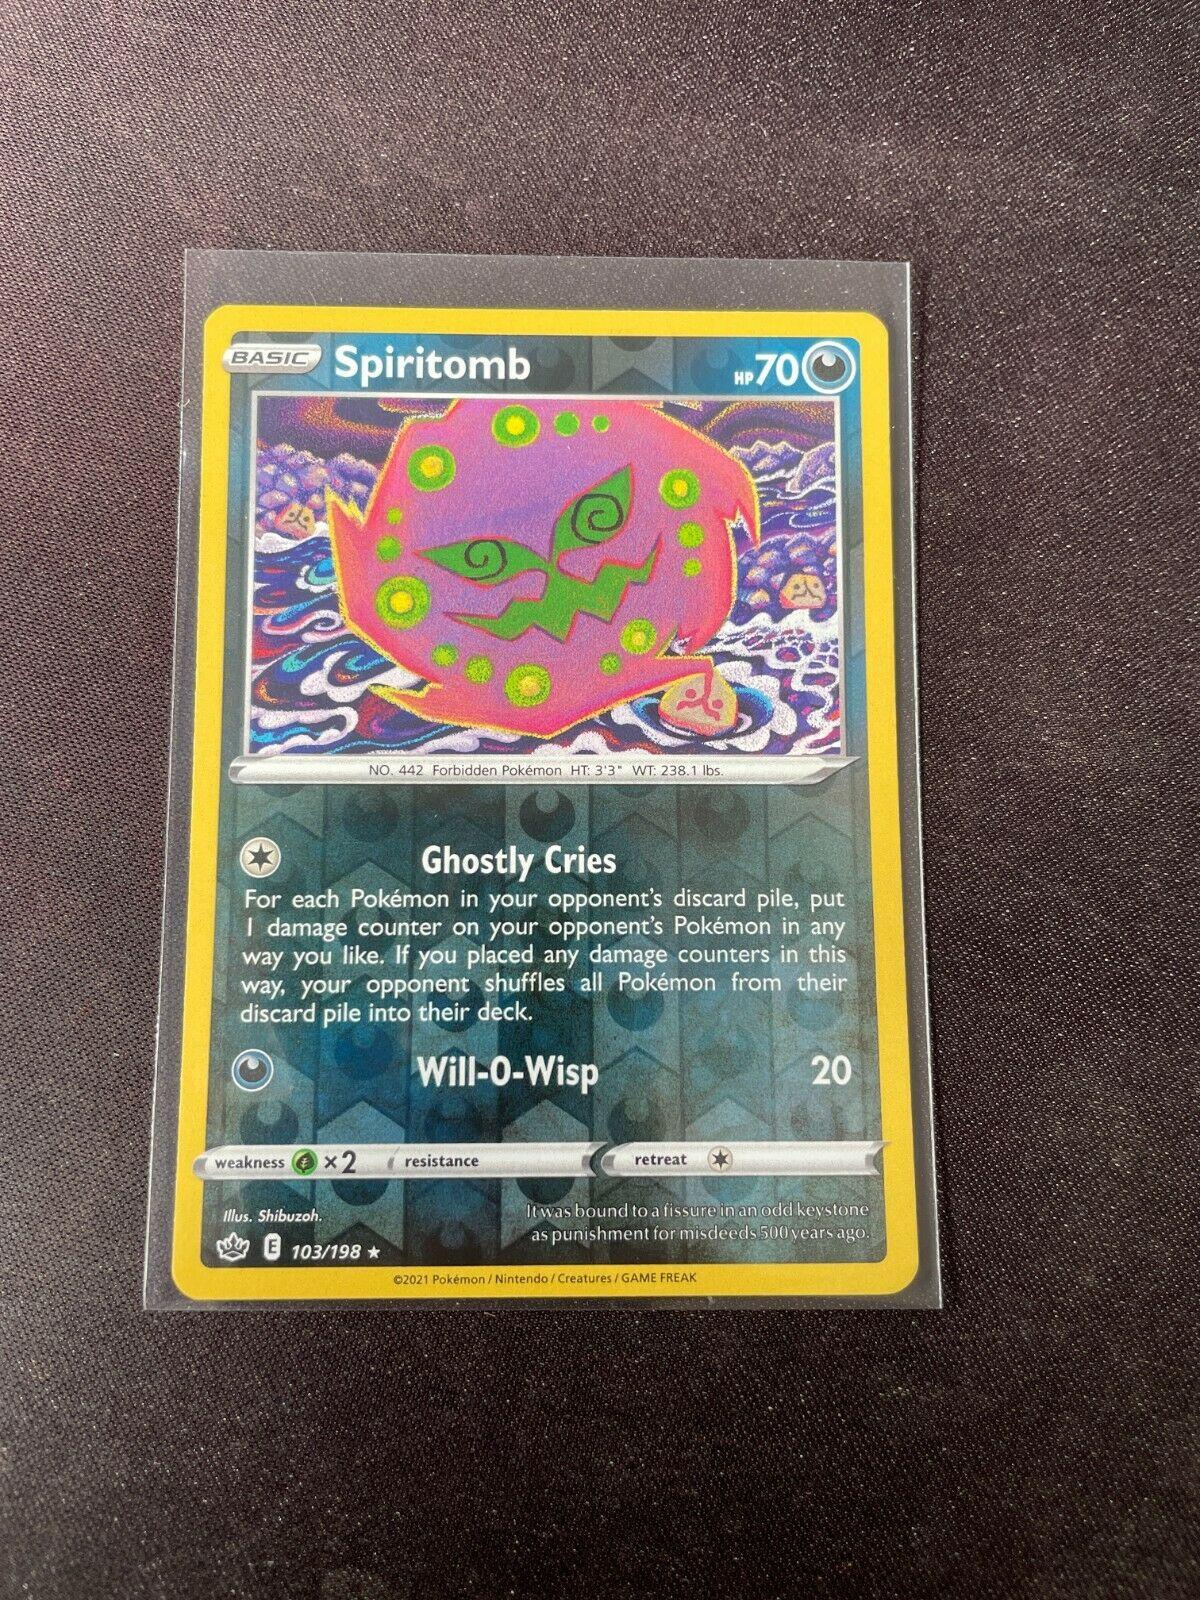 Pokemon TCG Chilling Reign 103/198 Spiritomb Card Fresh Reverse Holo Mint Rare